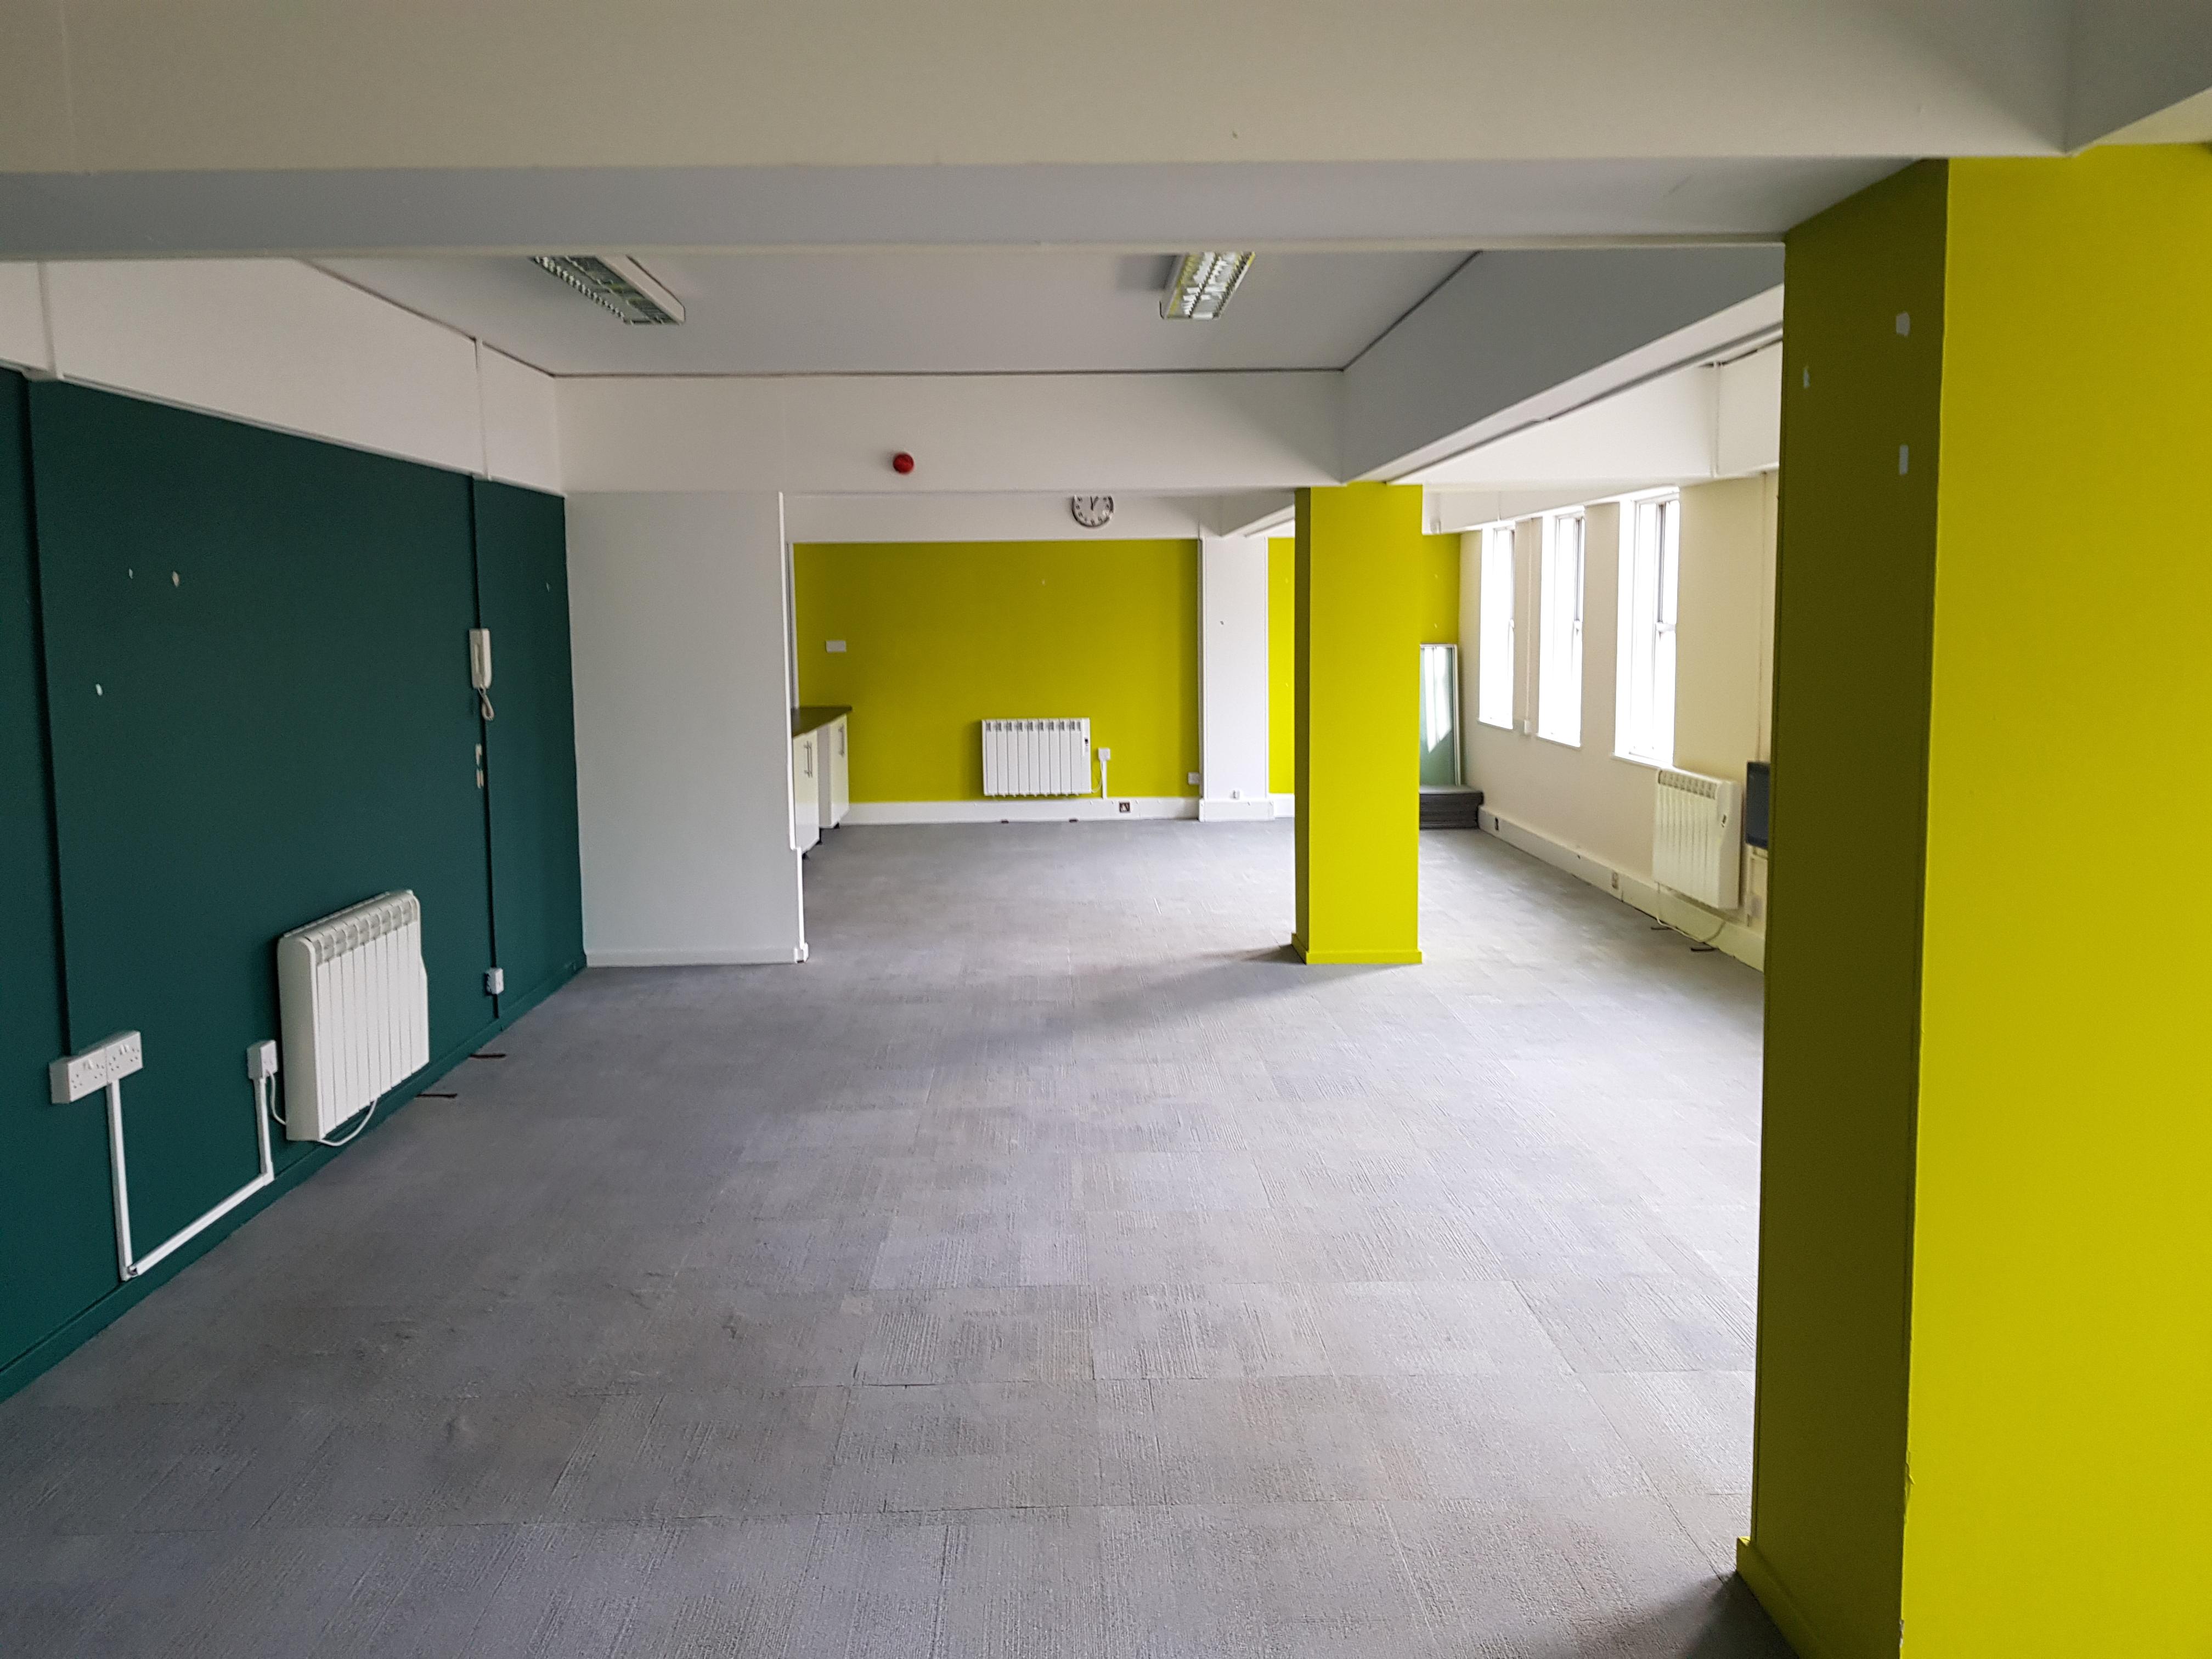 St Marys Green - office 1 interior